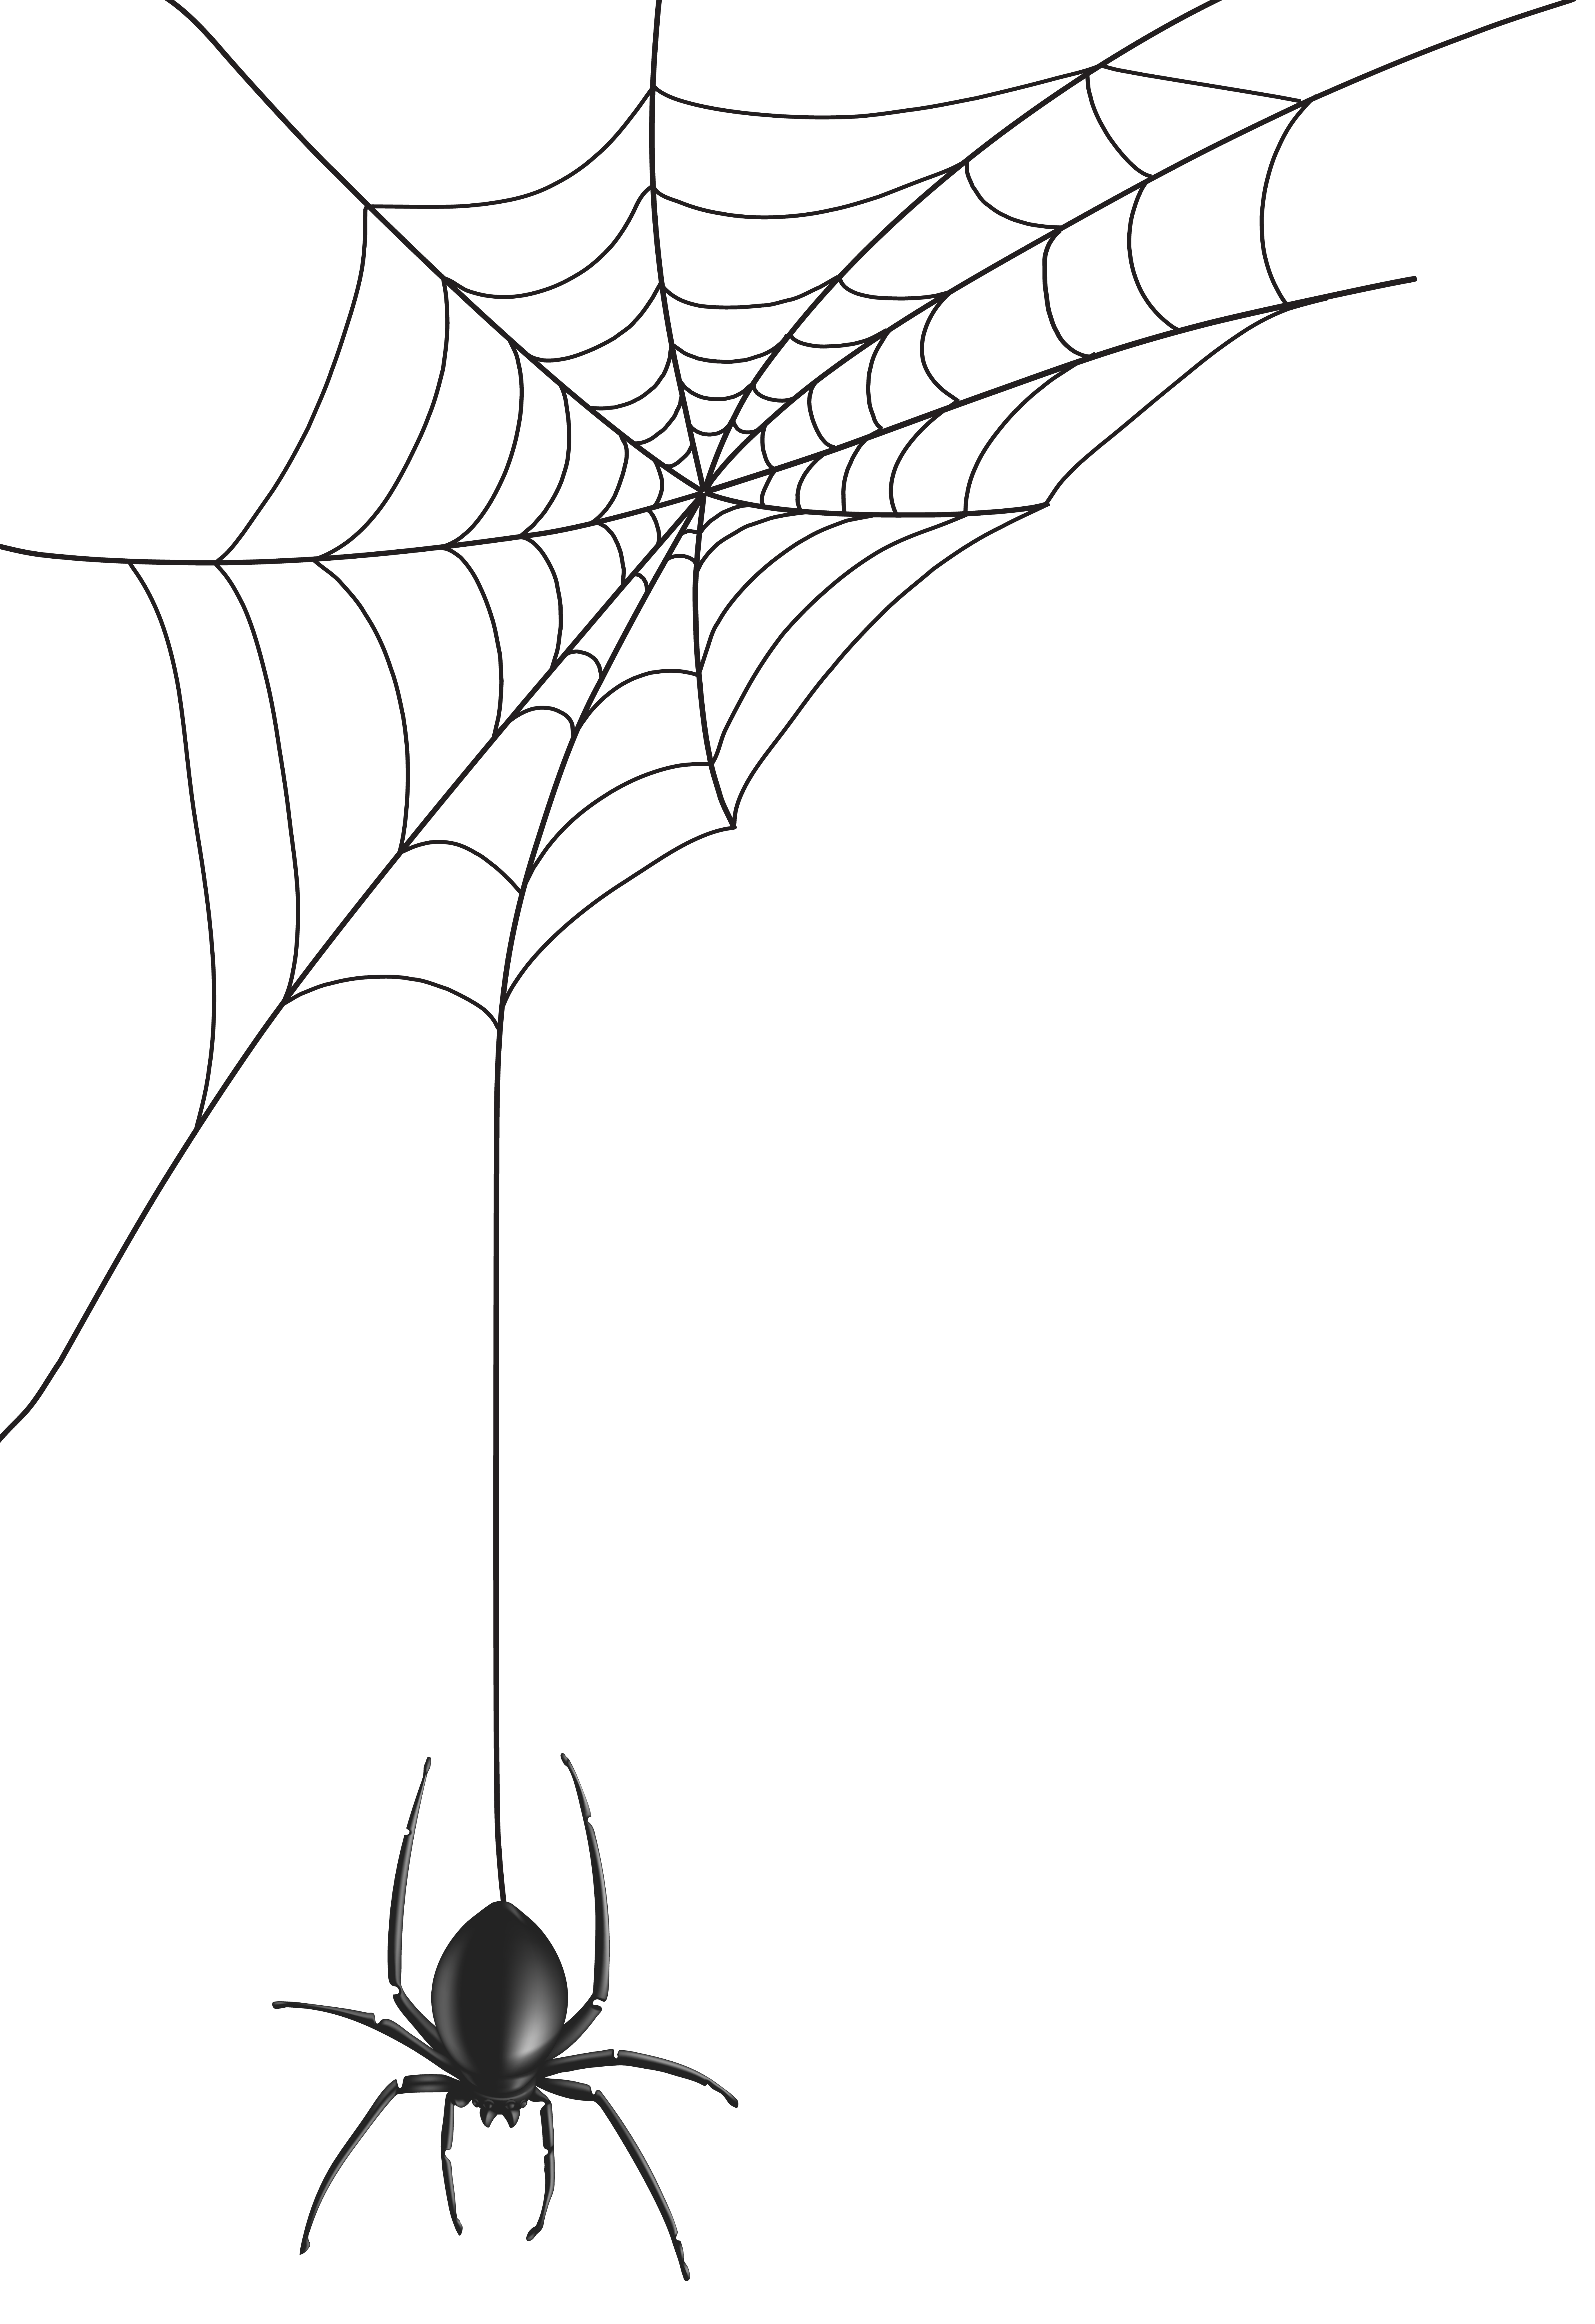 5491x8000 Spider Web Png Clip Art Imageu200b Gallery Yopriceville